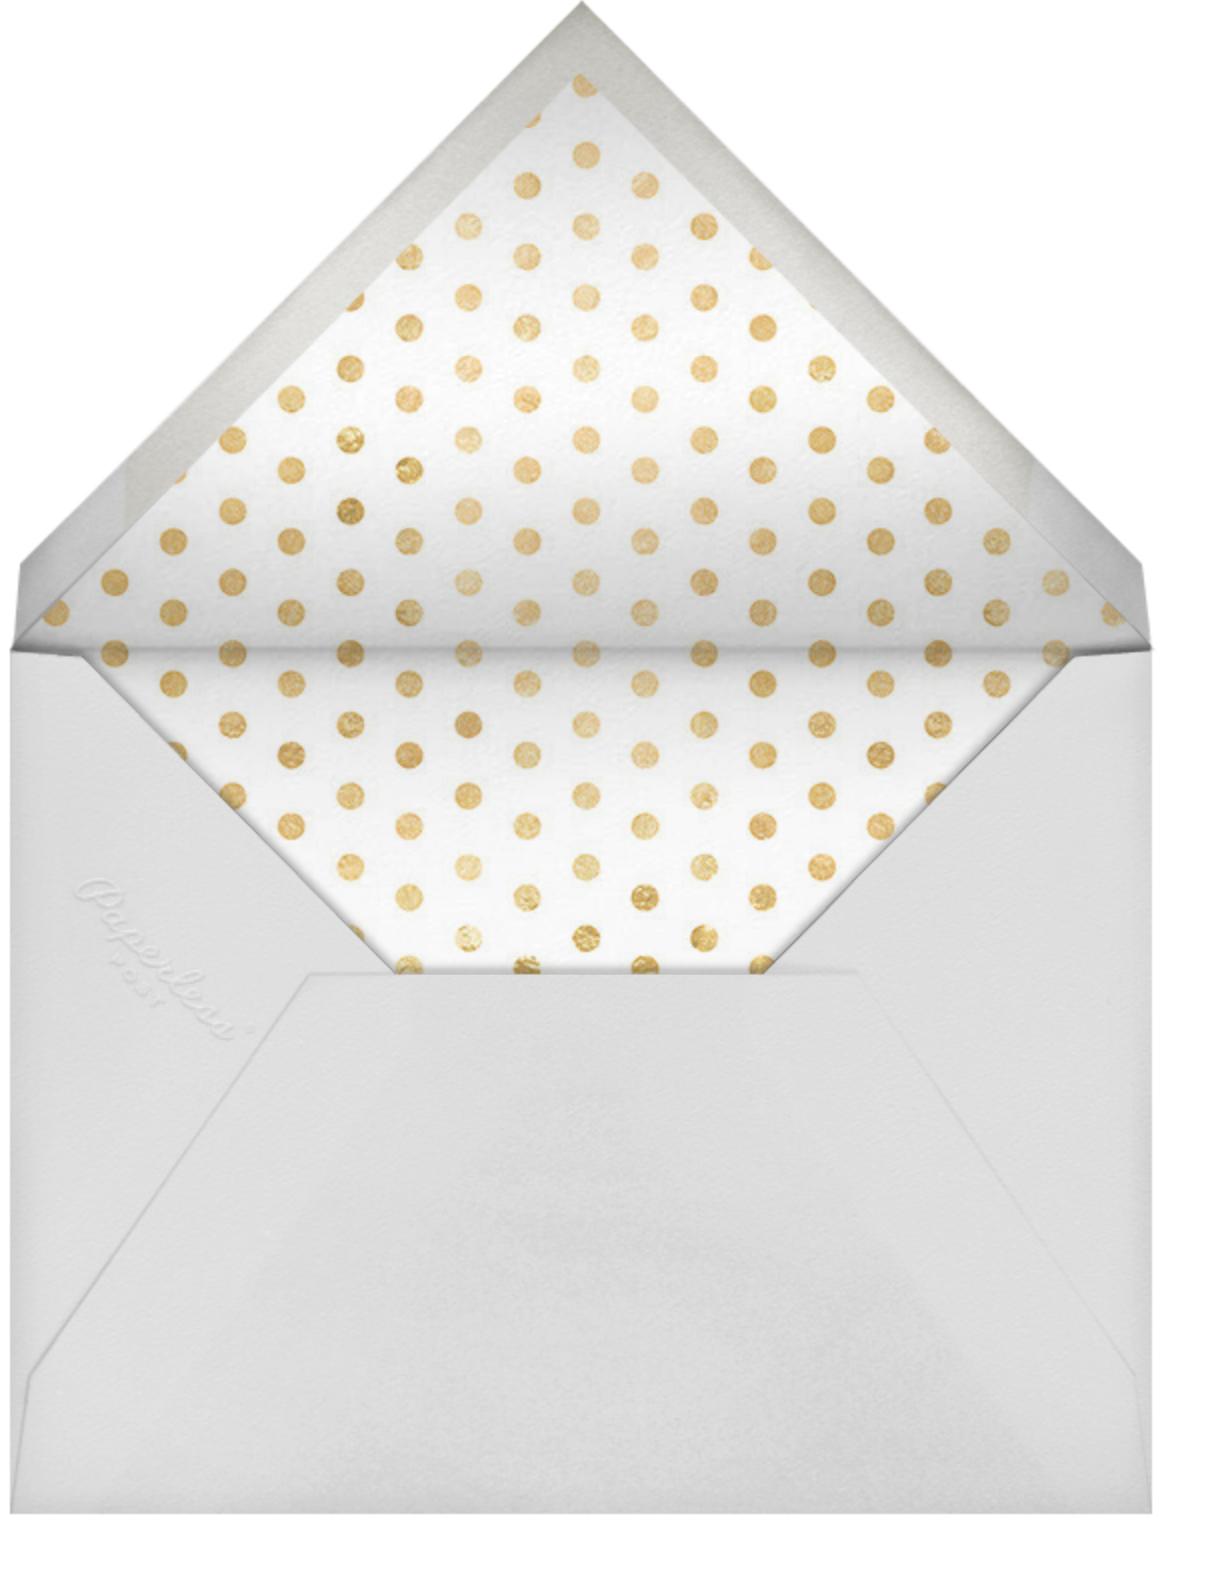 Cabana Birthday (Photo) - Black - Sugar Paper - Adult birthday - envelope back